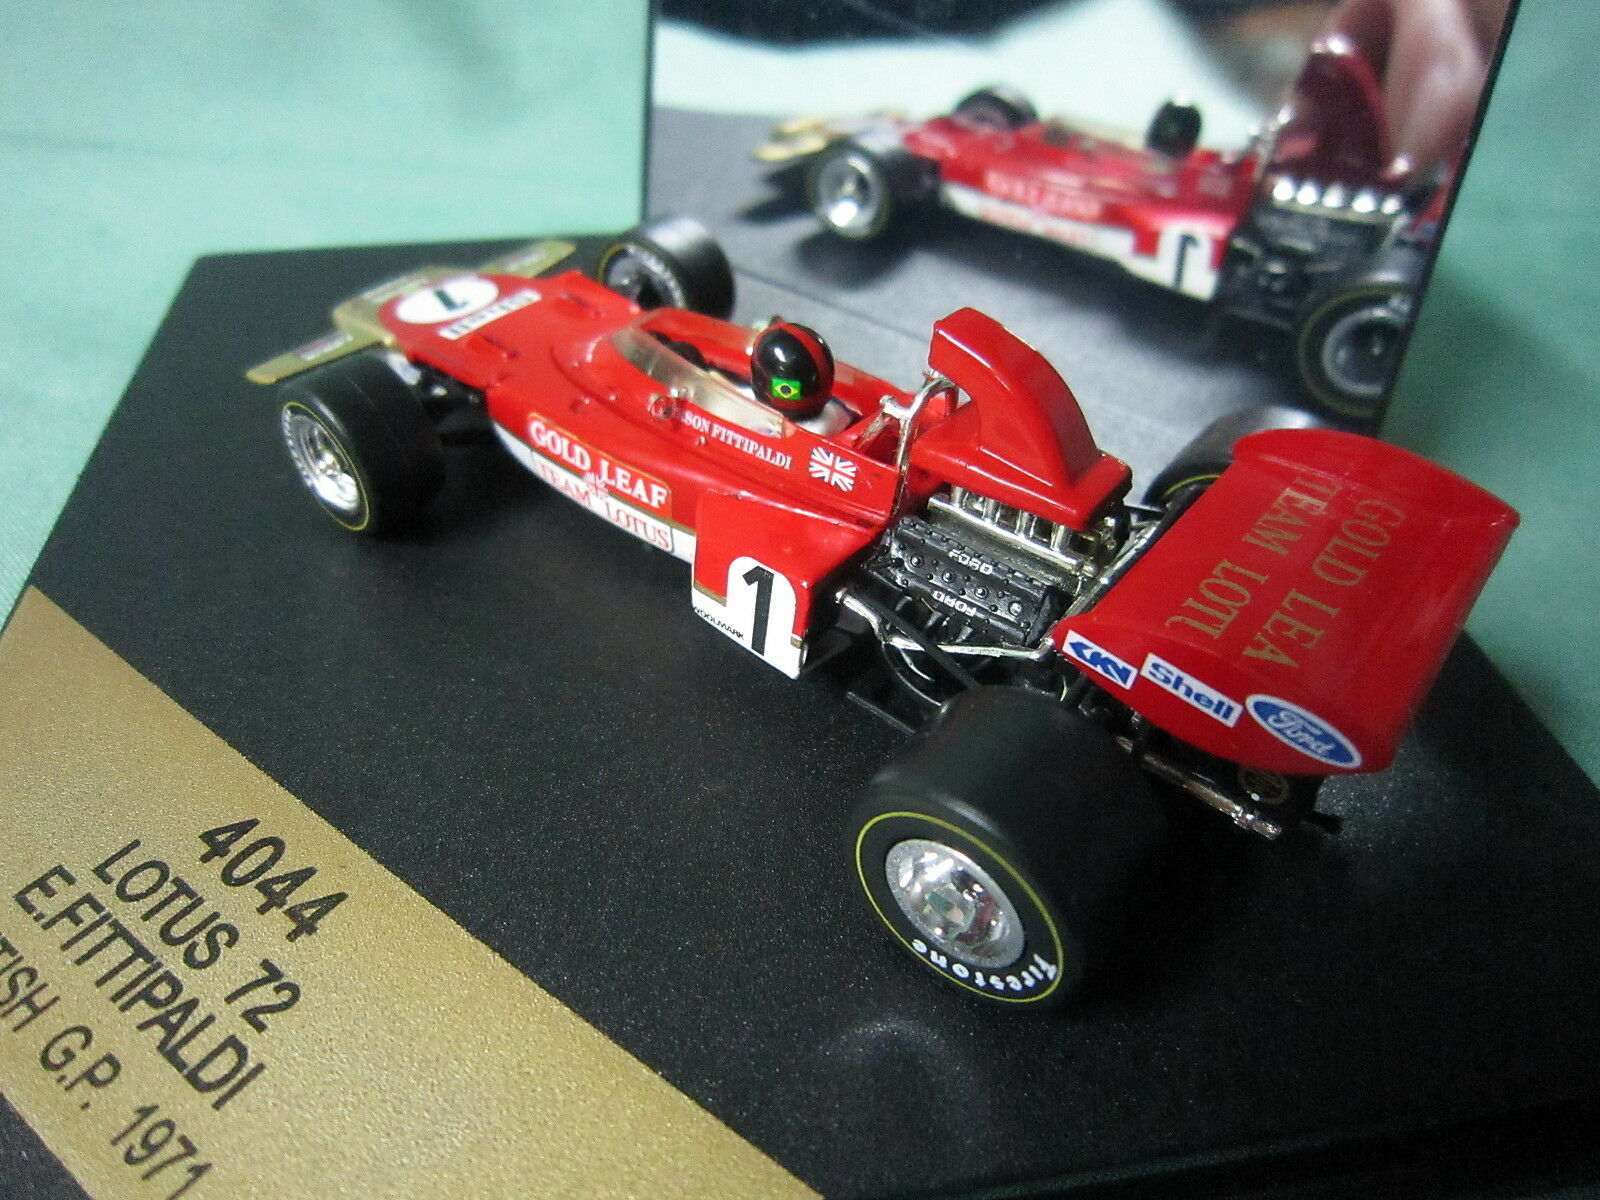 DV6048 QUARTZO VITESSE LOTUS 72 ANGLETERRE GP GP GP 1971 E FITTIPALDI 4044 1 43  F1 8e4aac